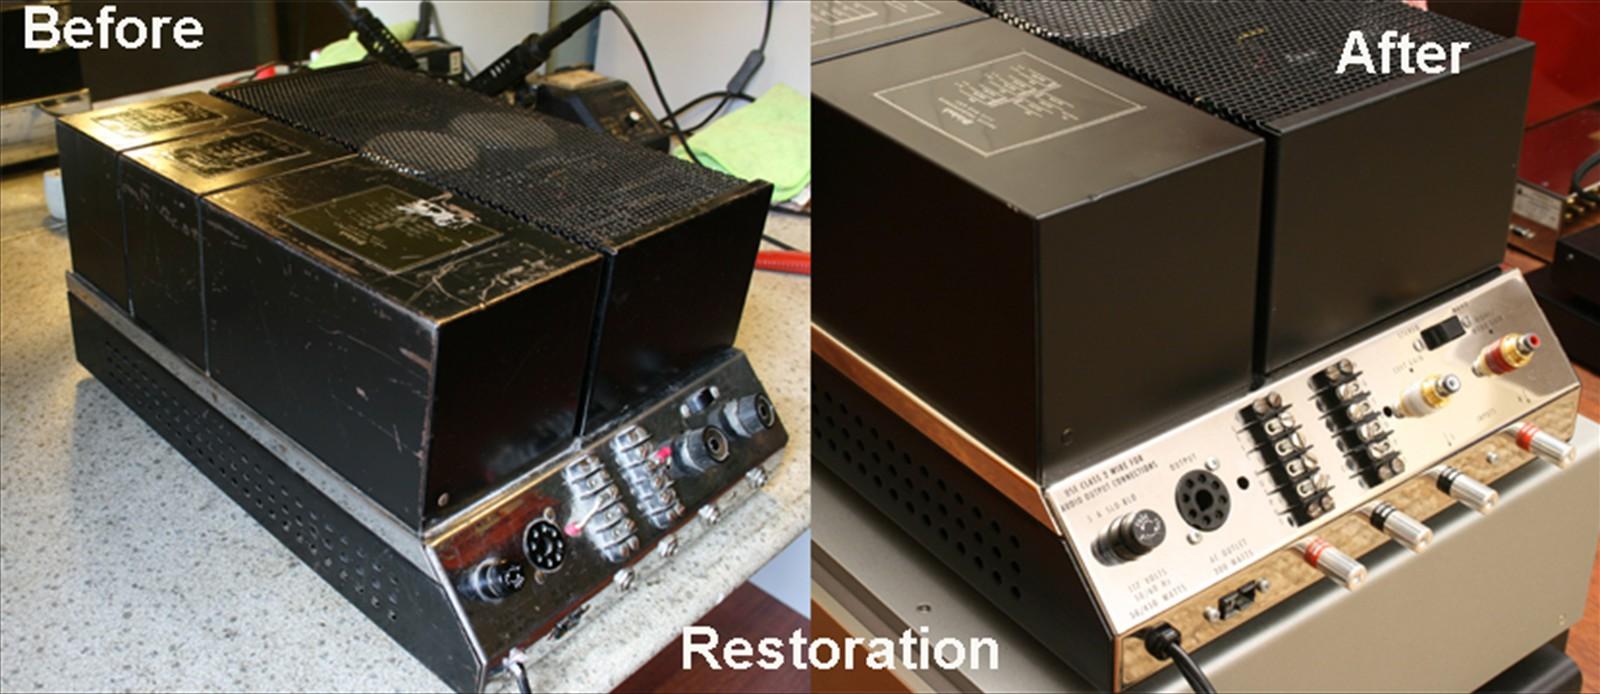 restorasyon3 copy